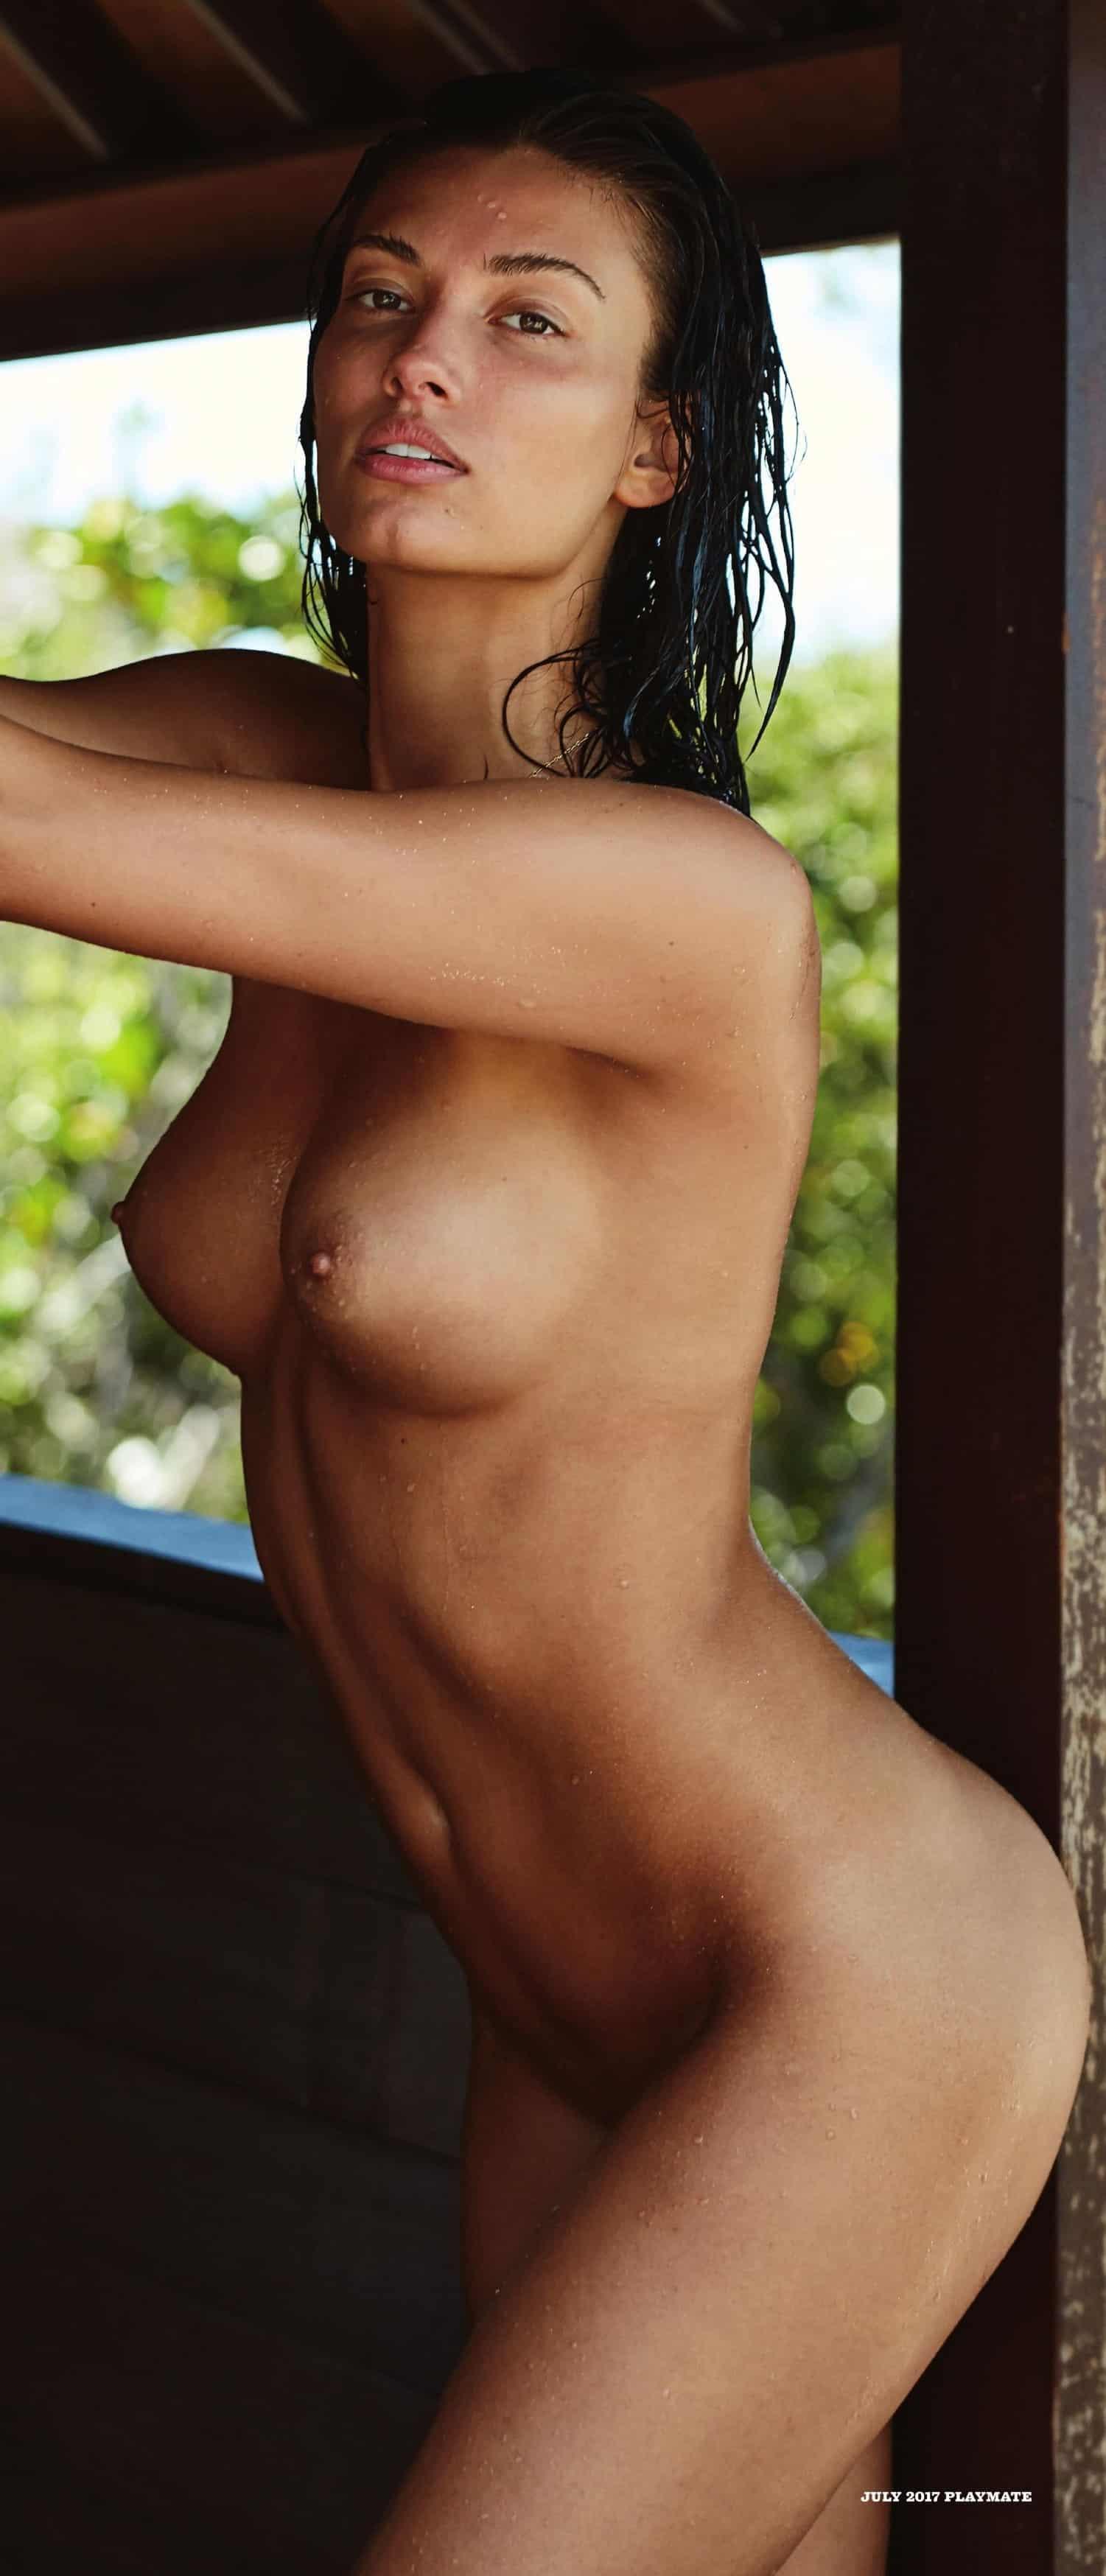 Erotica Dana Taylor nudes (36 photos), Ass, Leaked, Instagram, in bikini 2015